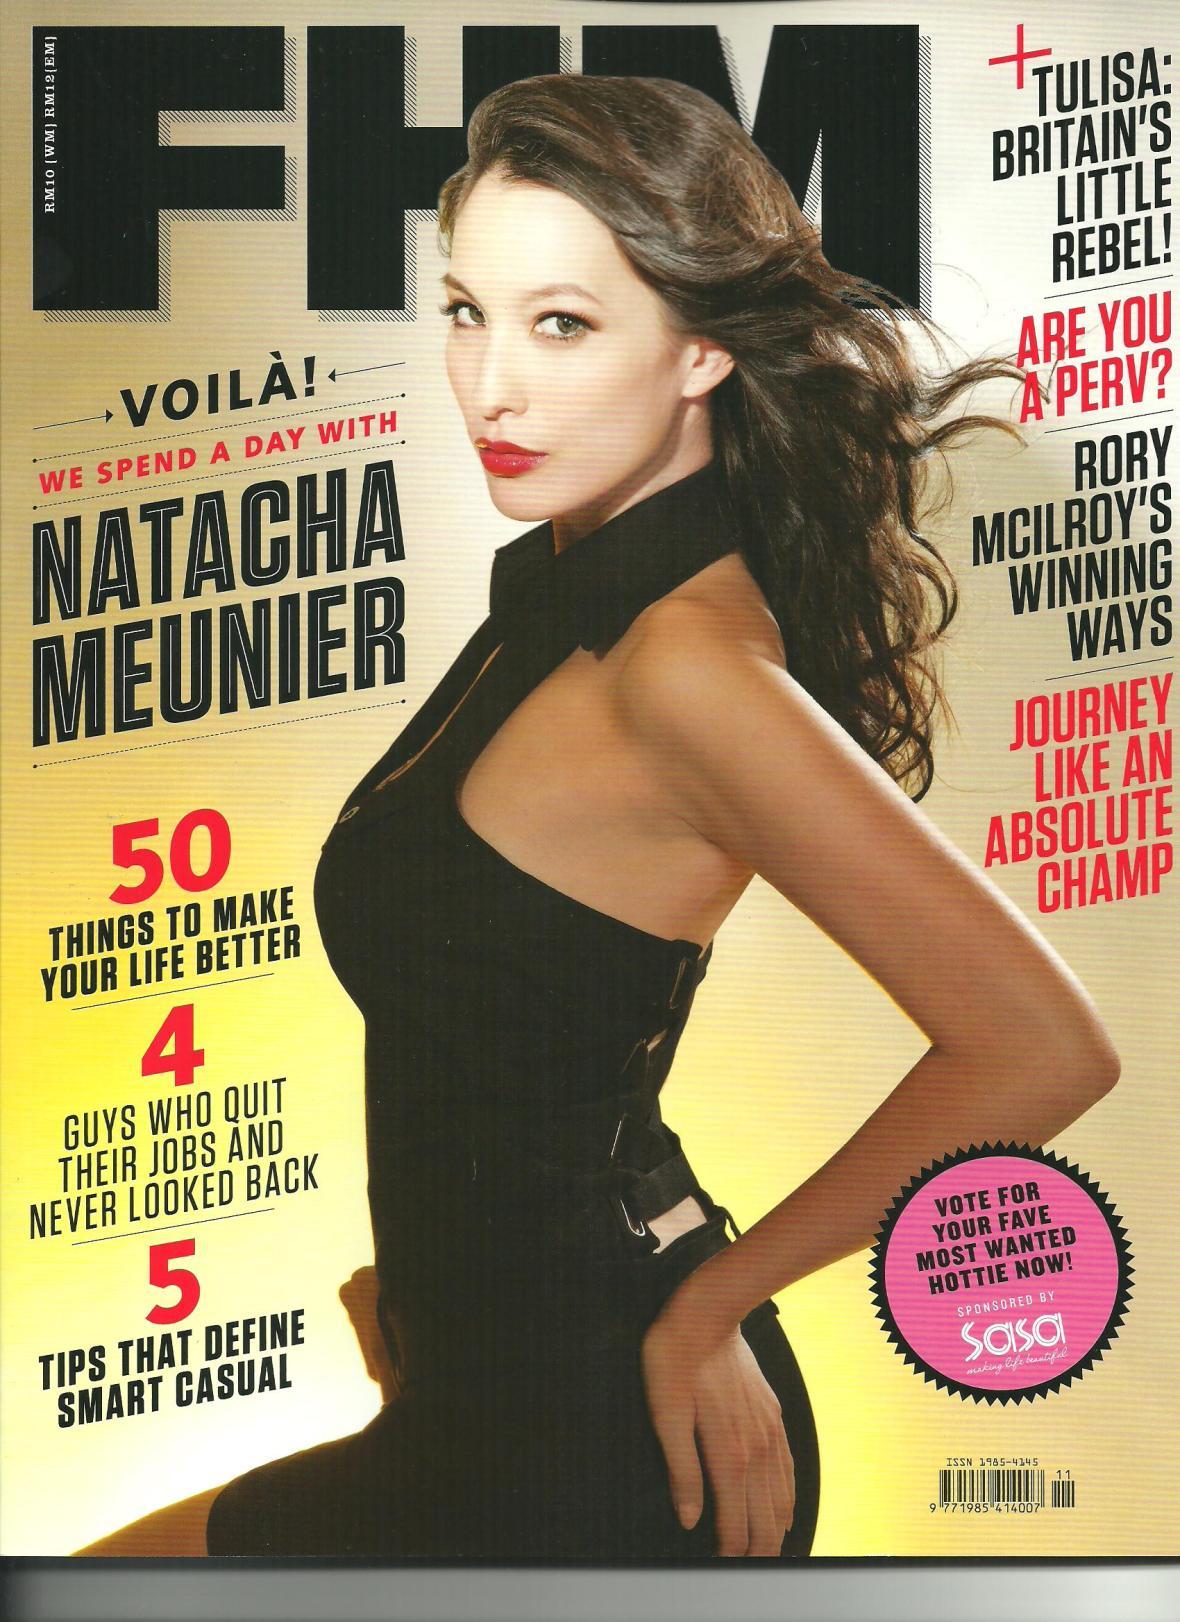 Natacha Meunier_MSI Modeling Agency in Bangkok Thailand_By Miss Josie Sang (1)